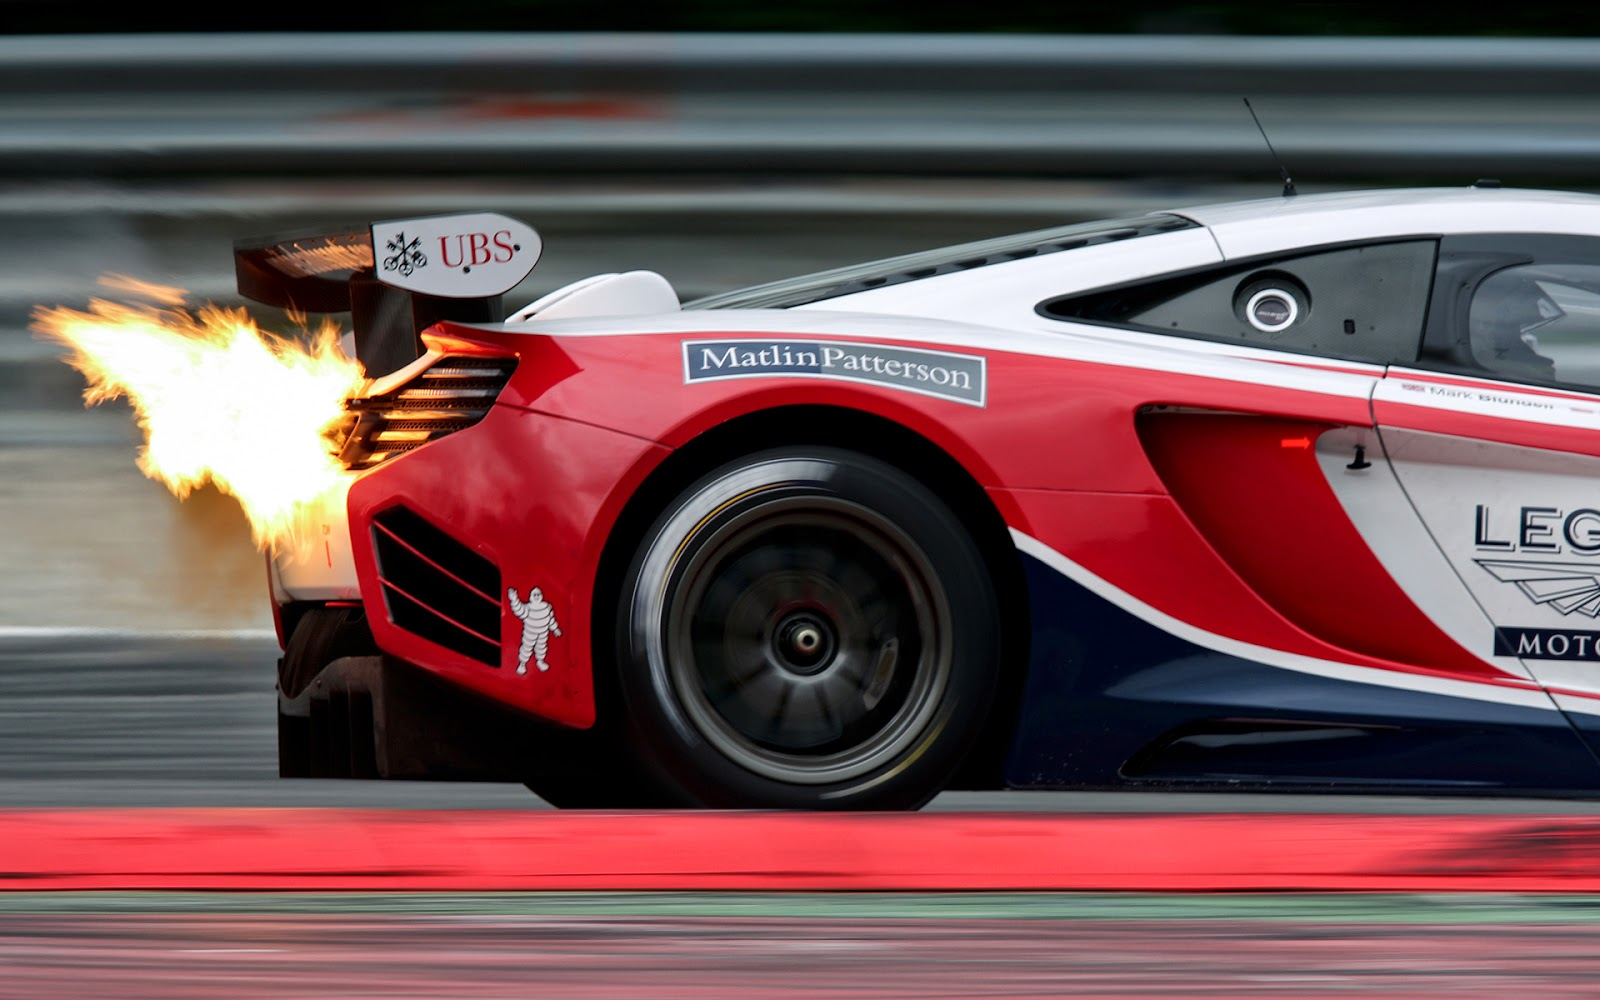 http://www.autocarsinfo.com/2014/12/blancpain-audi-exhaust-best-wallpaper.html